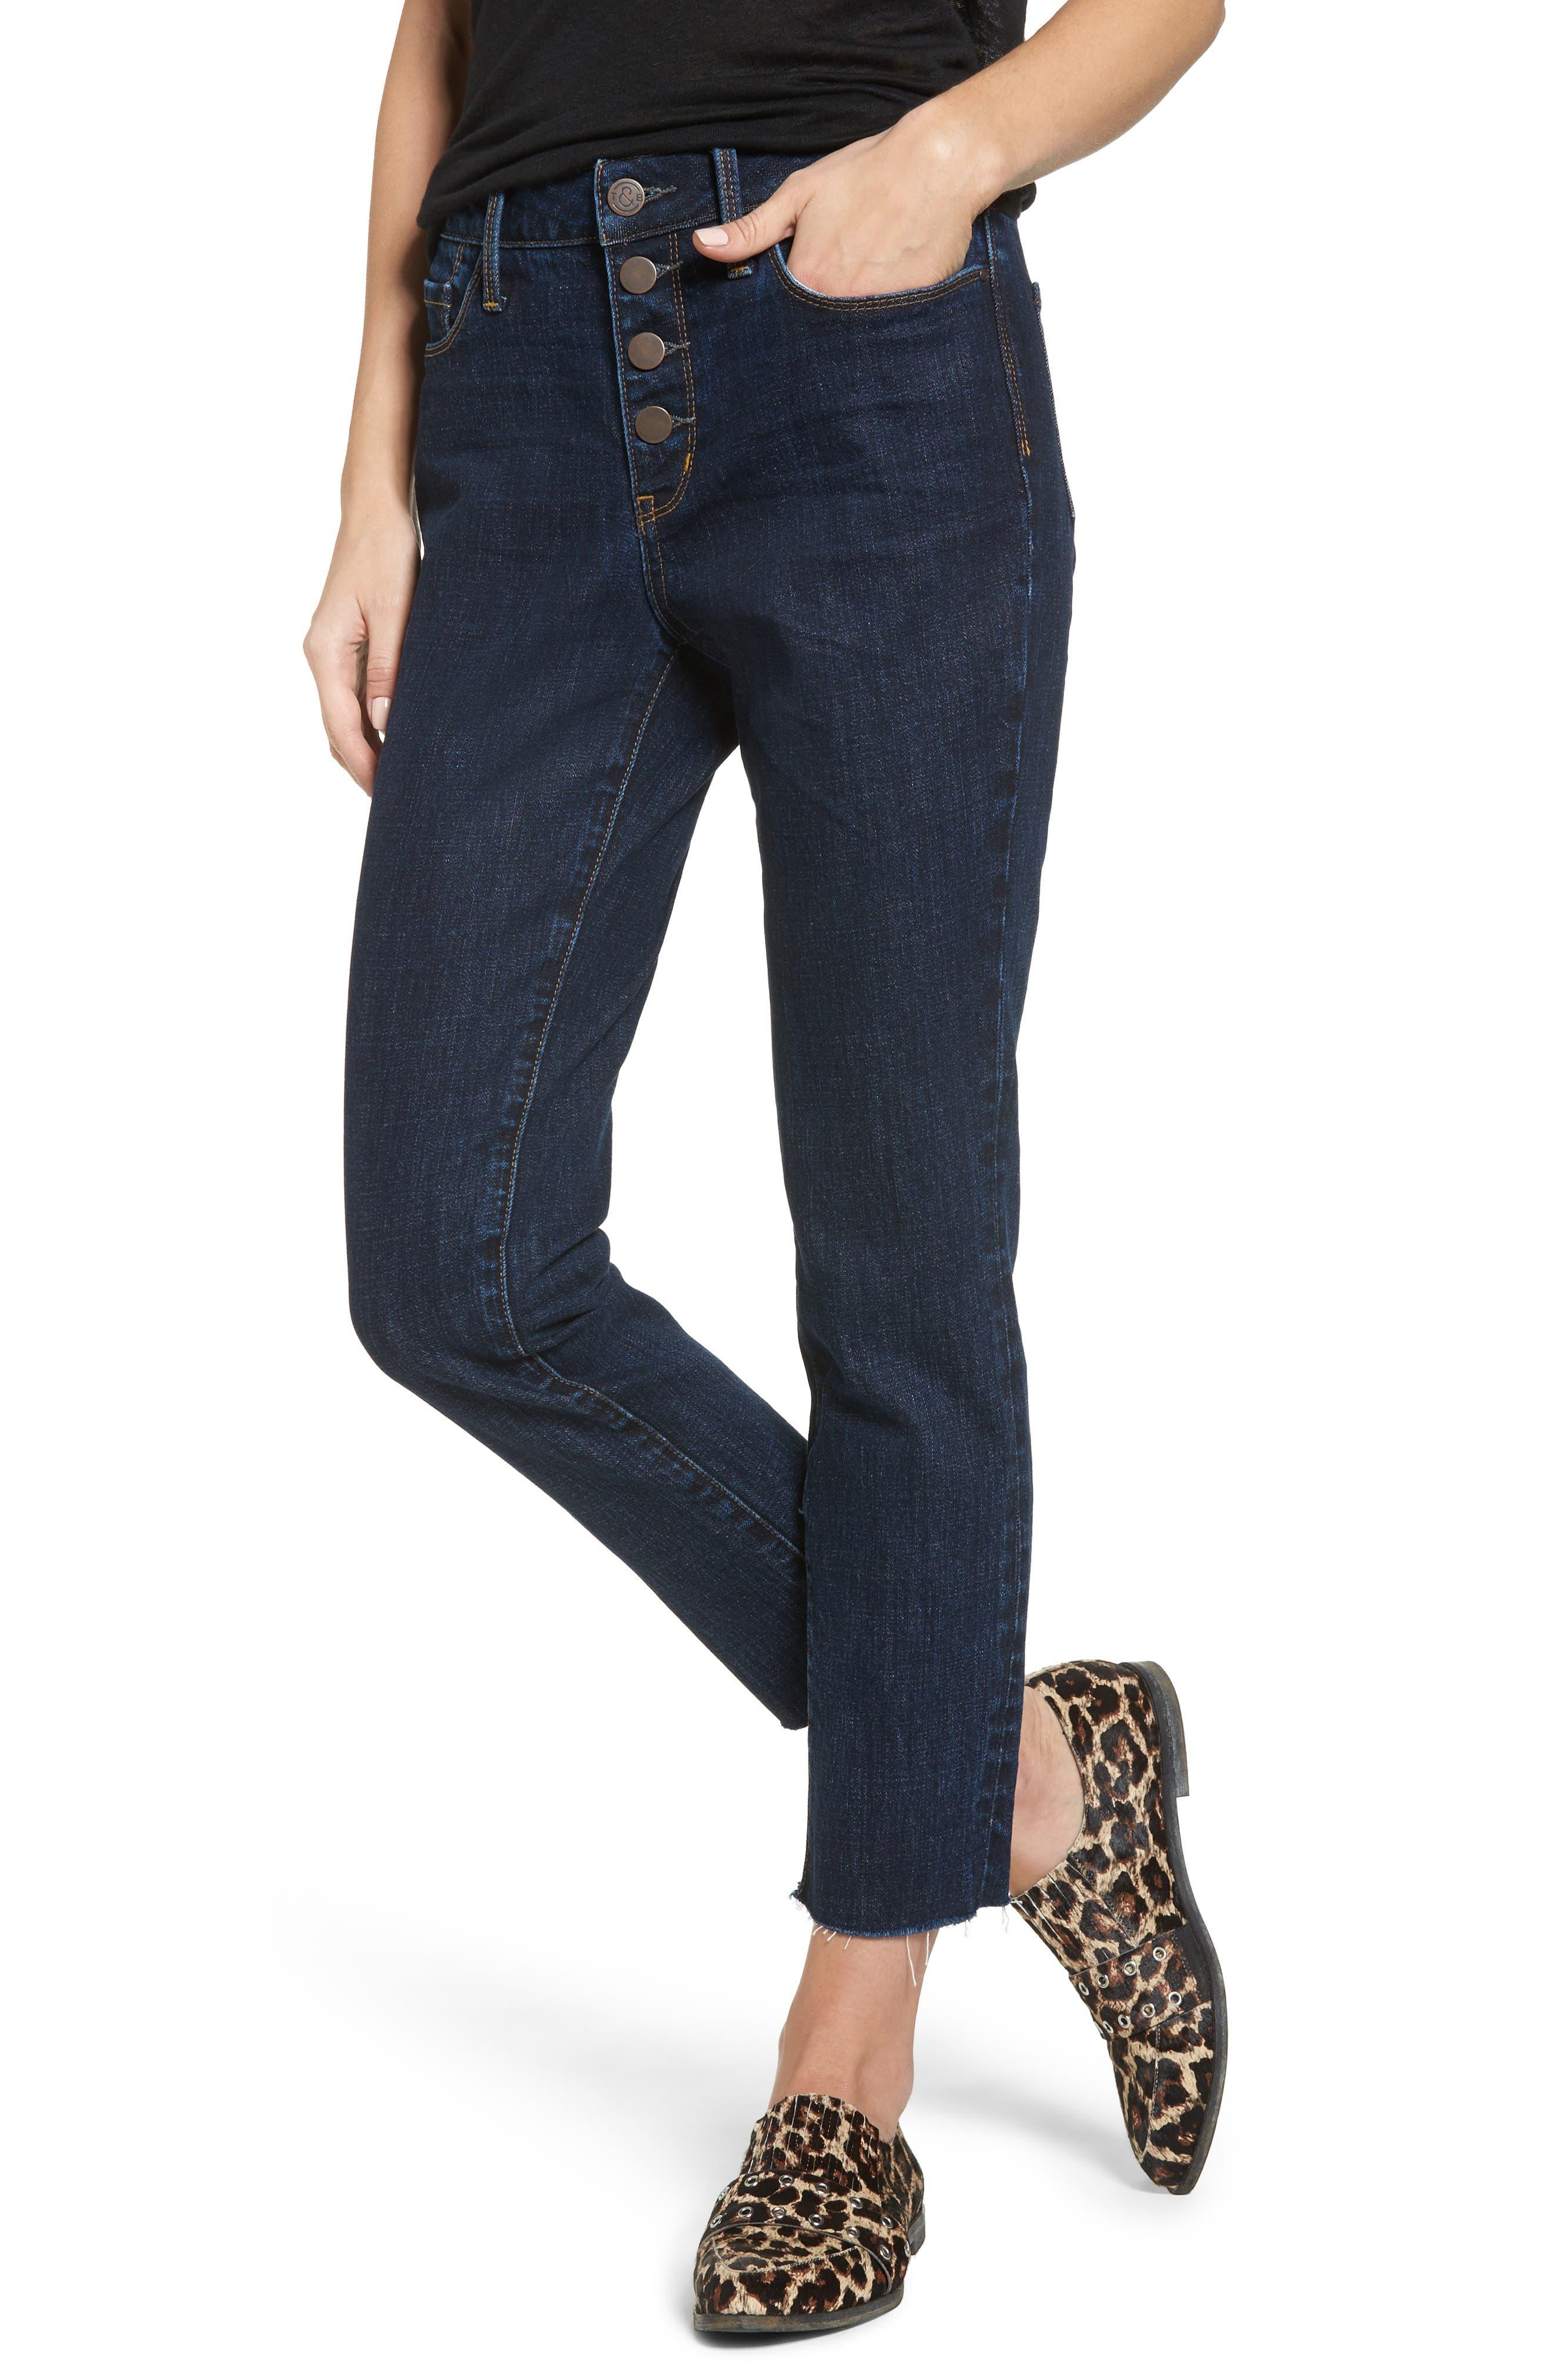 Alternate Image 1 Selected - Treasure & Bond Bond Loose Fit Skinny Ankle Jeans (Granite Dark Vintage)